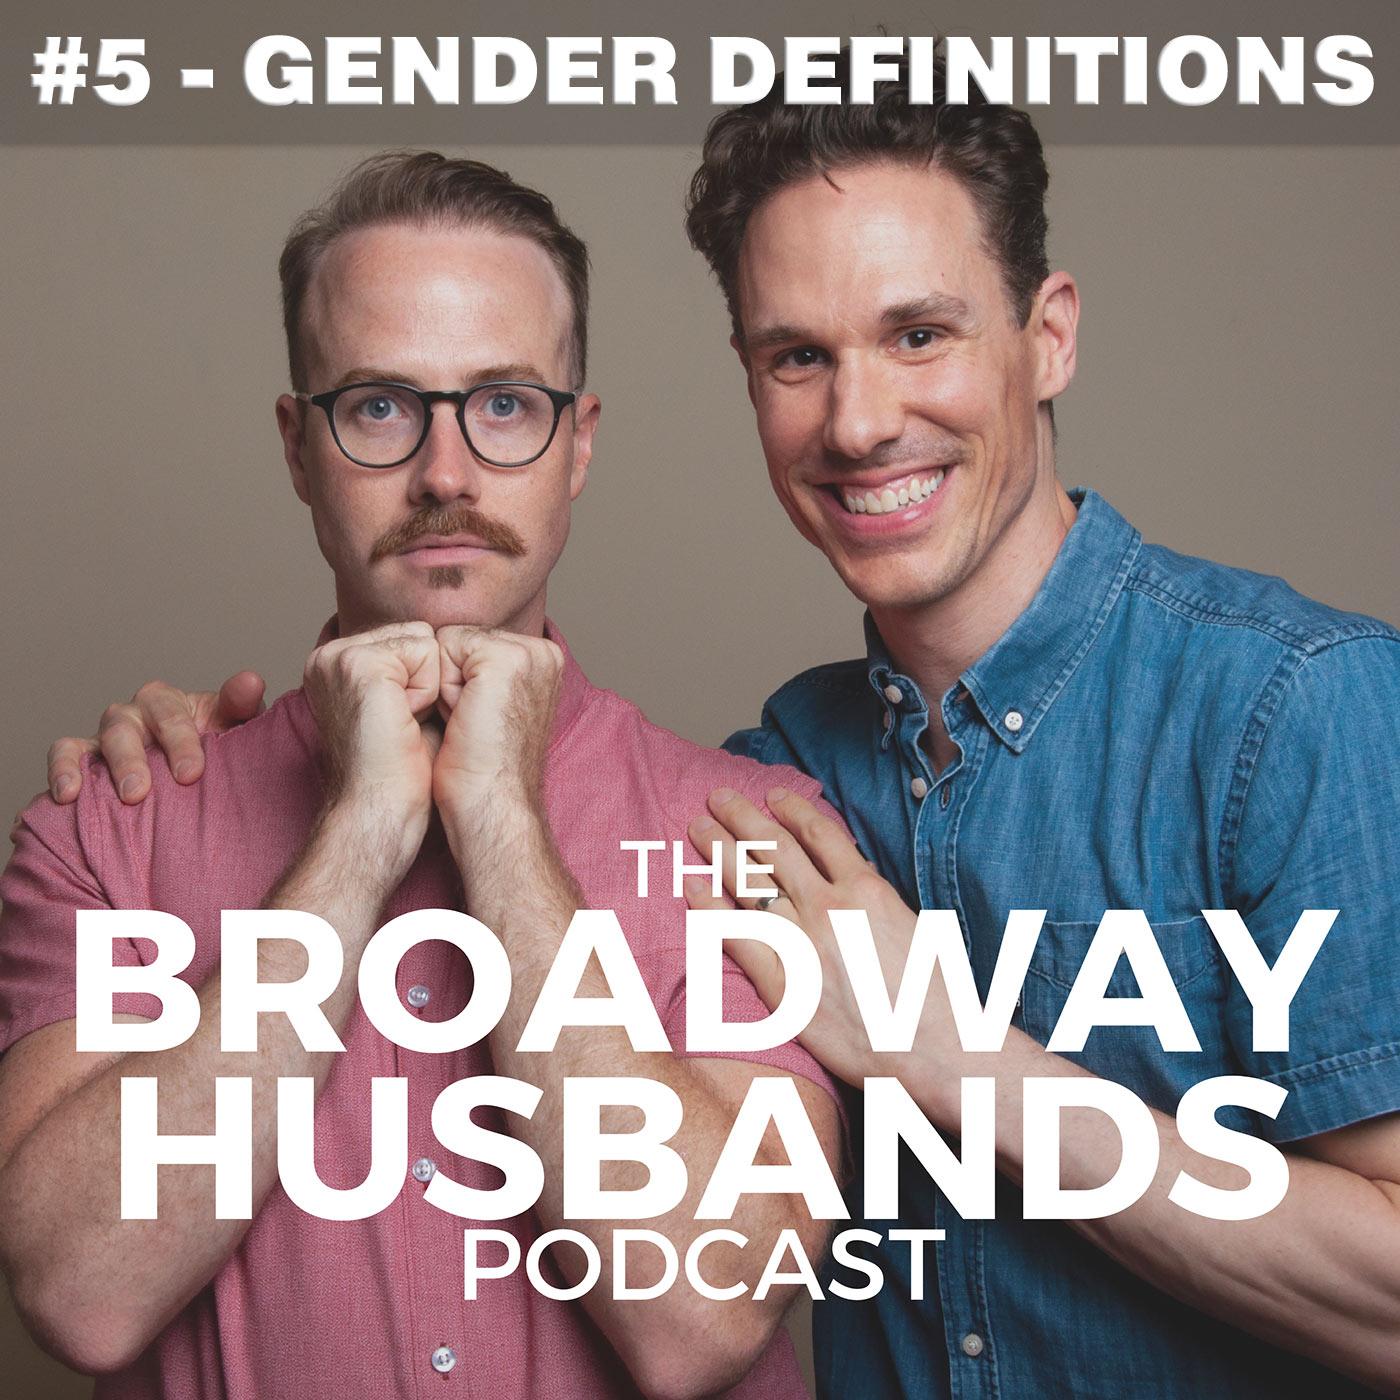 #5 - Gender Definitions